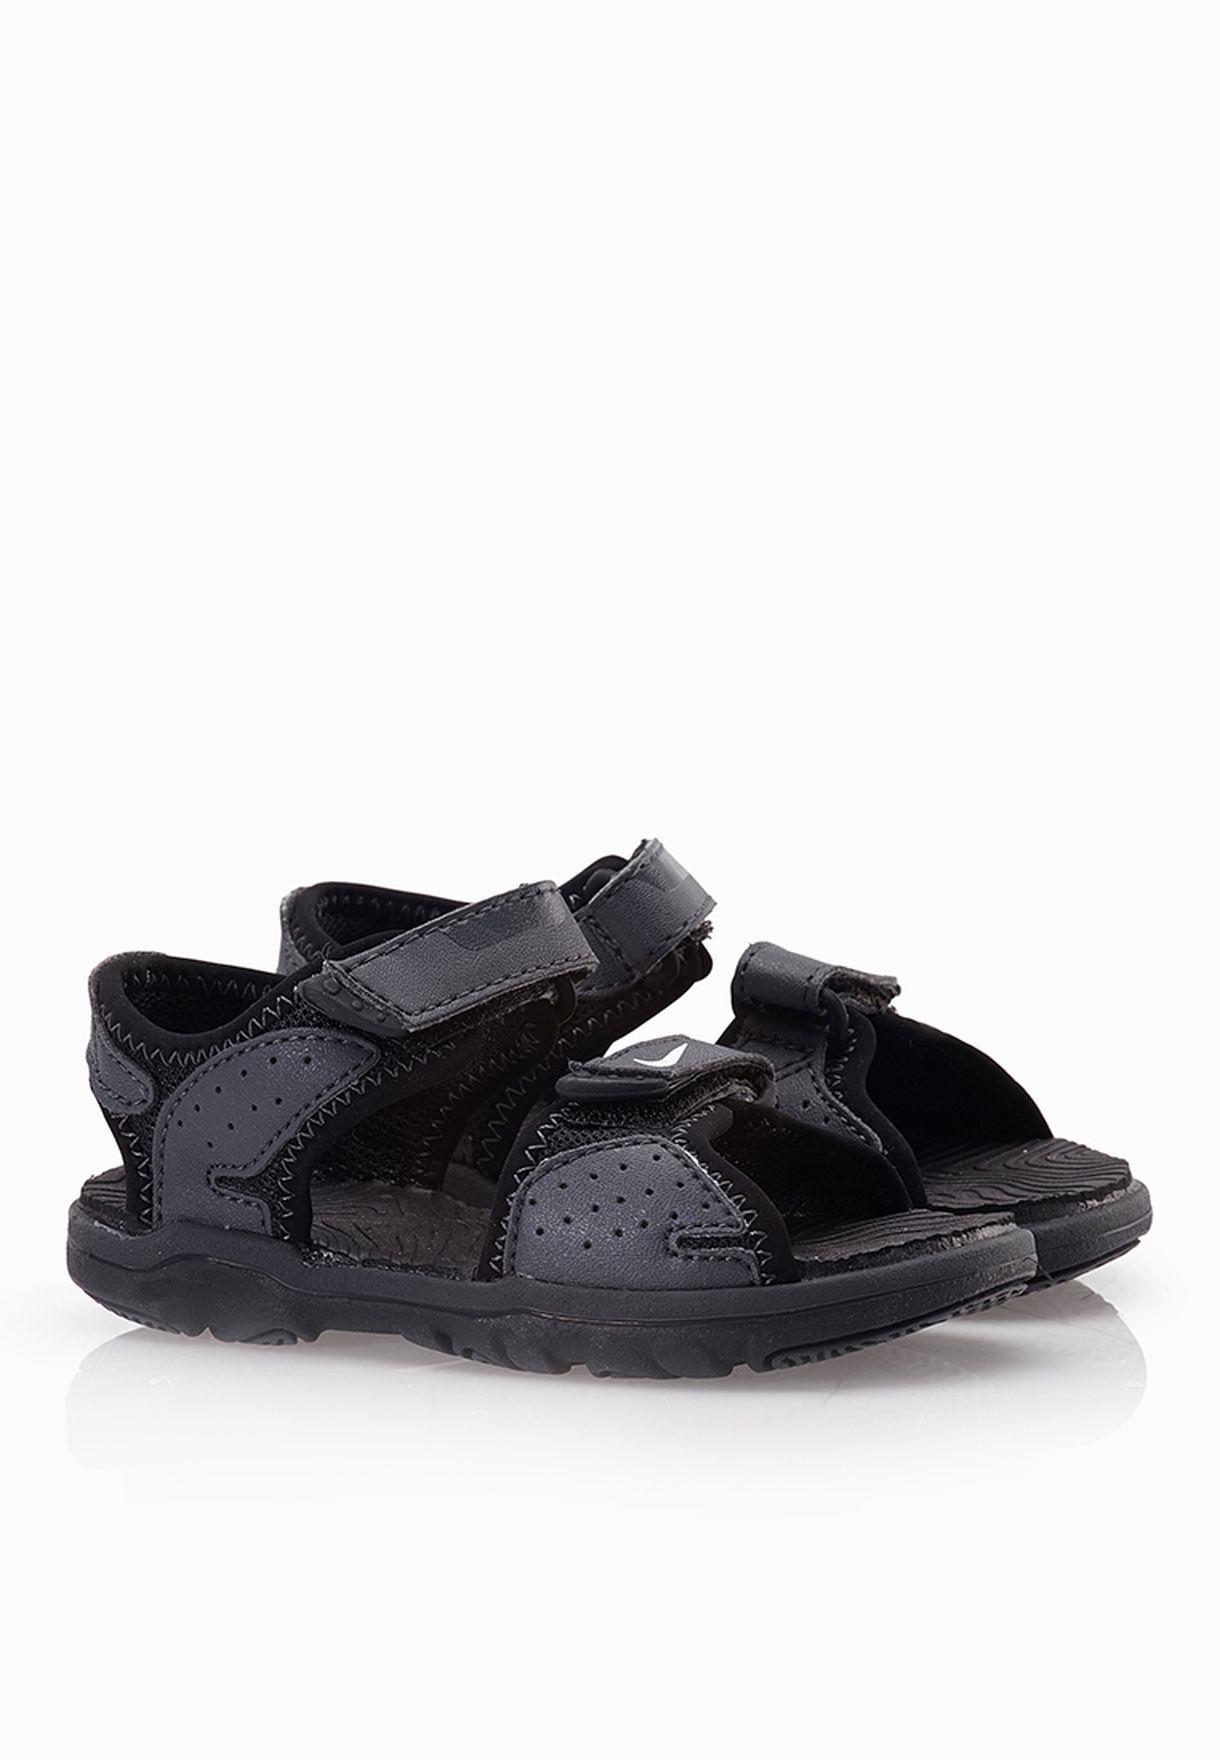 3621f28caf73 Shop Nike grey Santiam 5 Infant 344632-011 for Kids in UAE ...